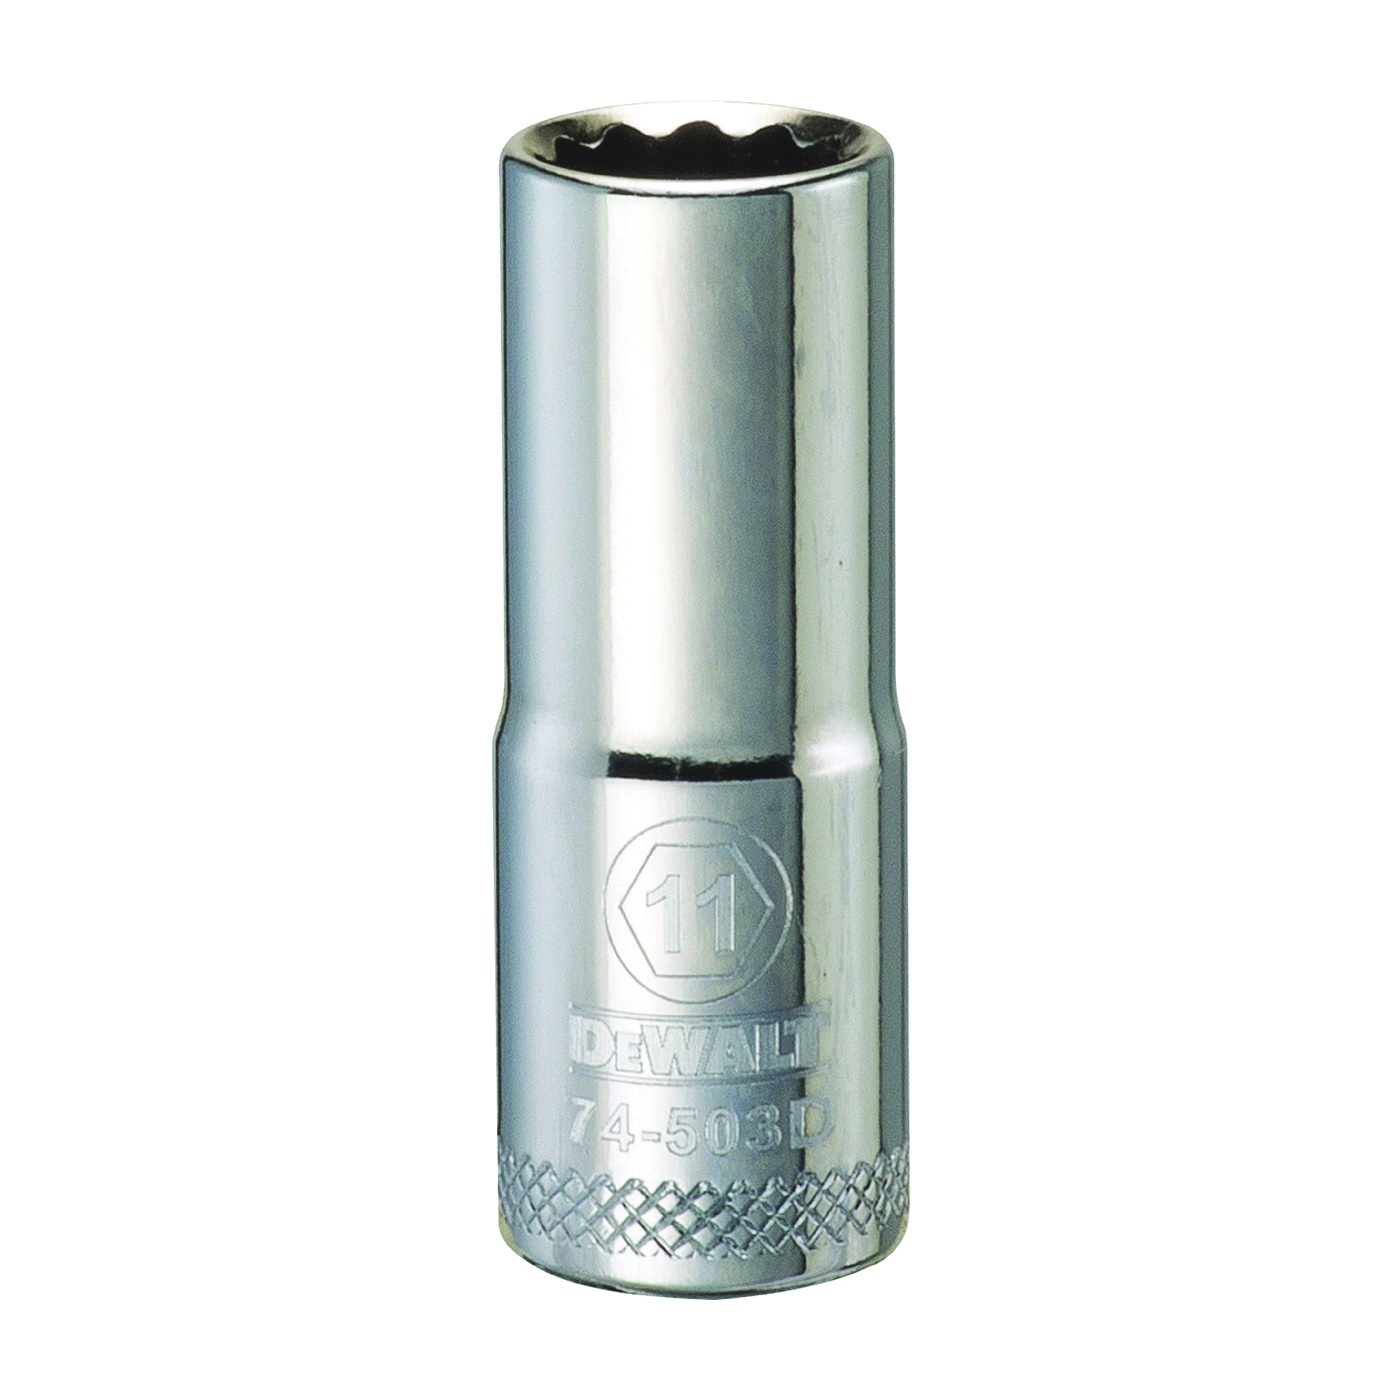 Picture of DeWALT DWMT74503OSP Drive Socket, 11 mm Socket, 3/8 in Drive, 12 -Point, Vanadium Steel, Polished Chrome